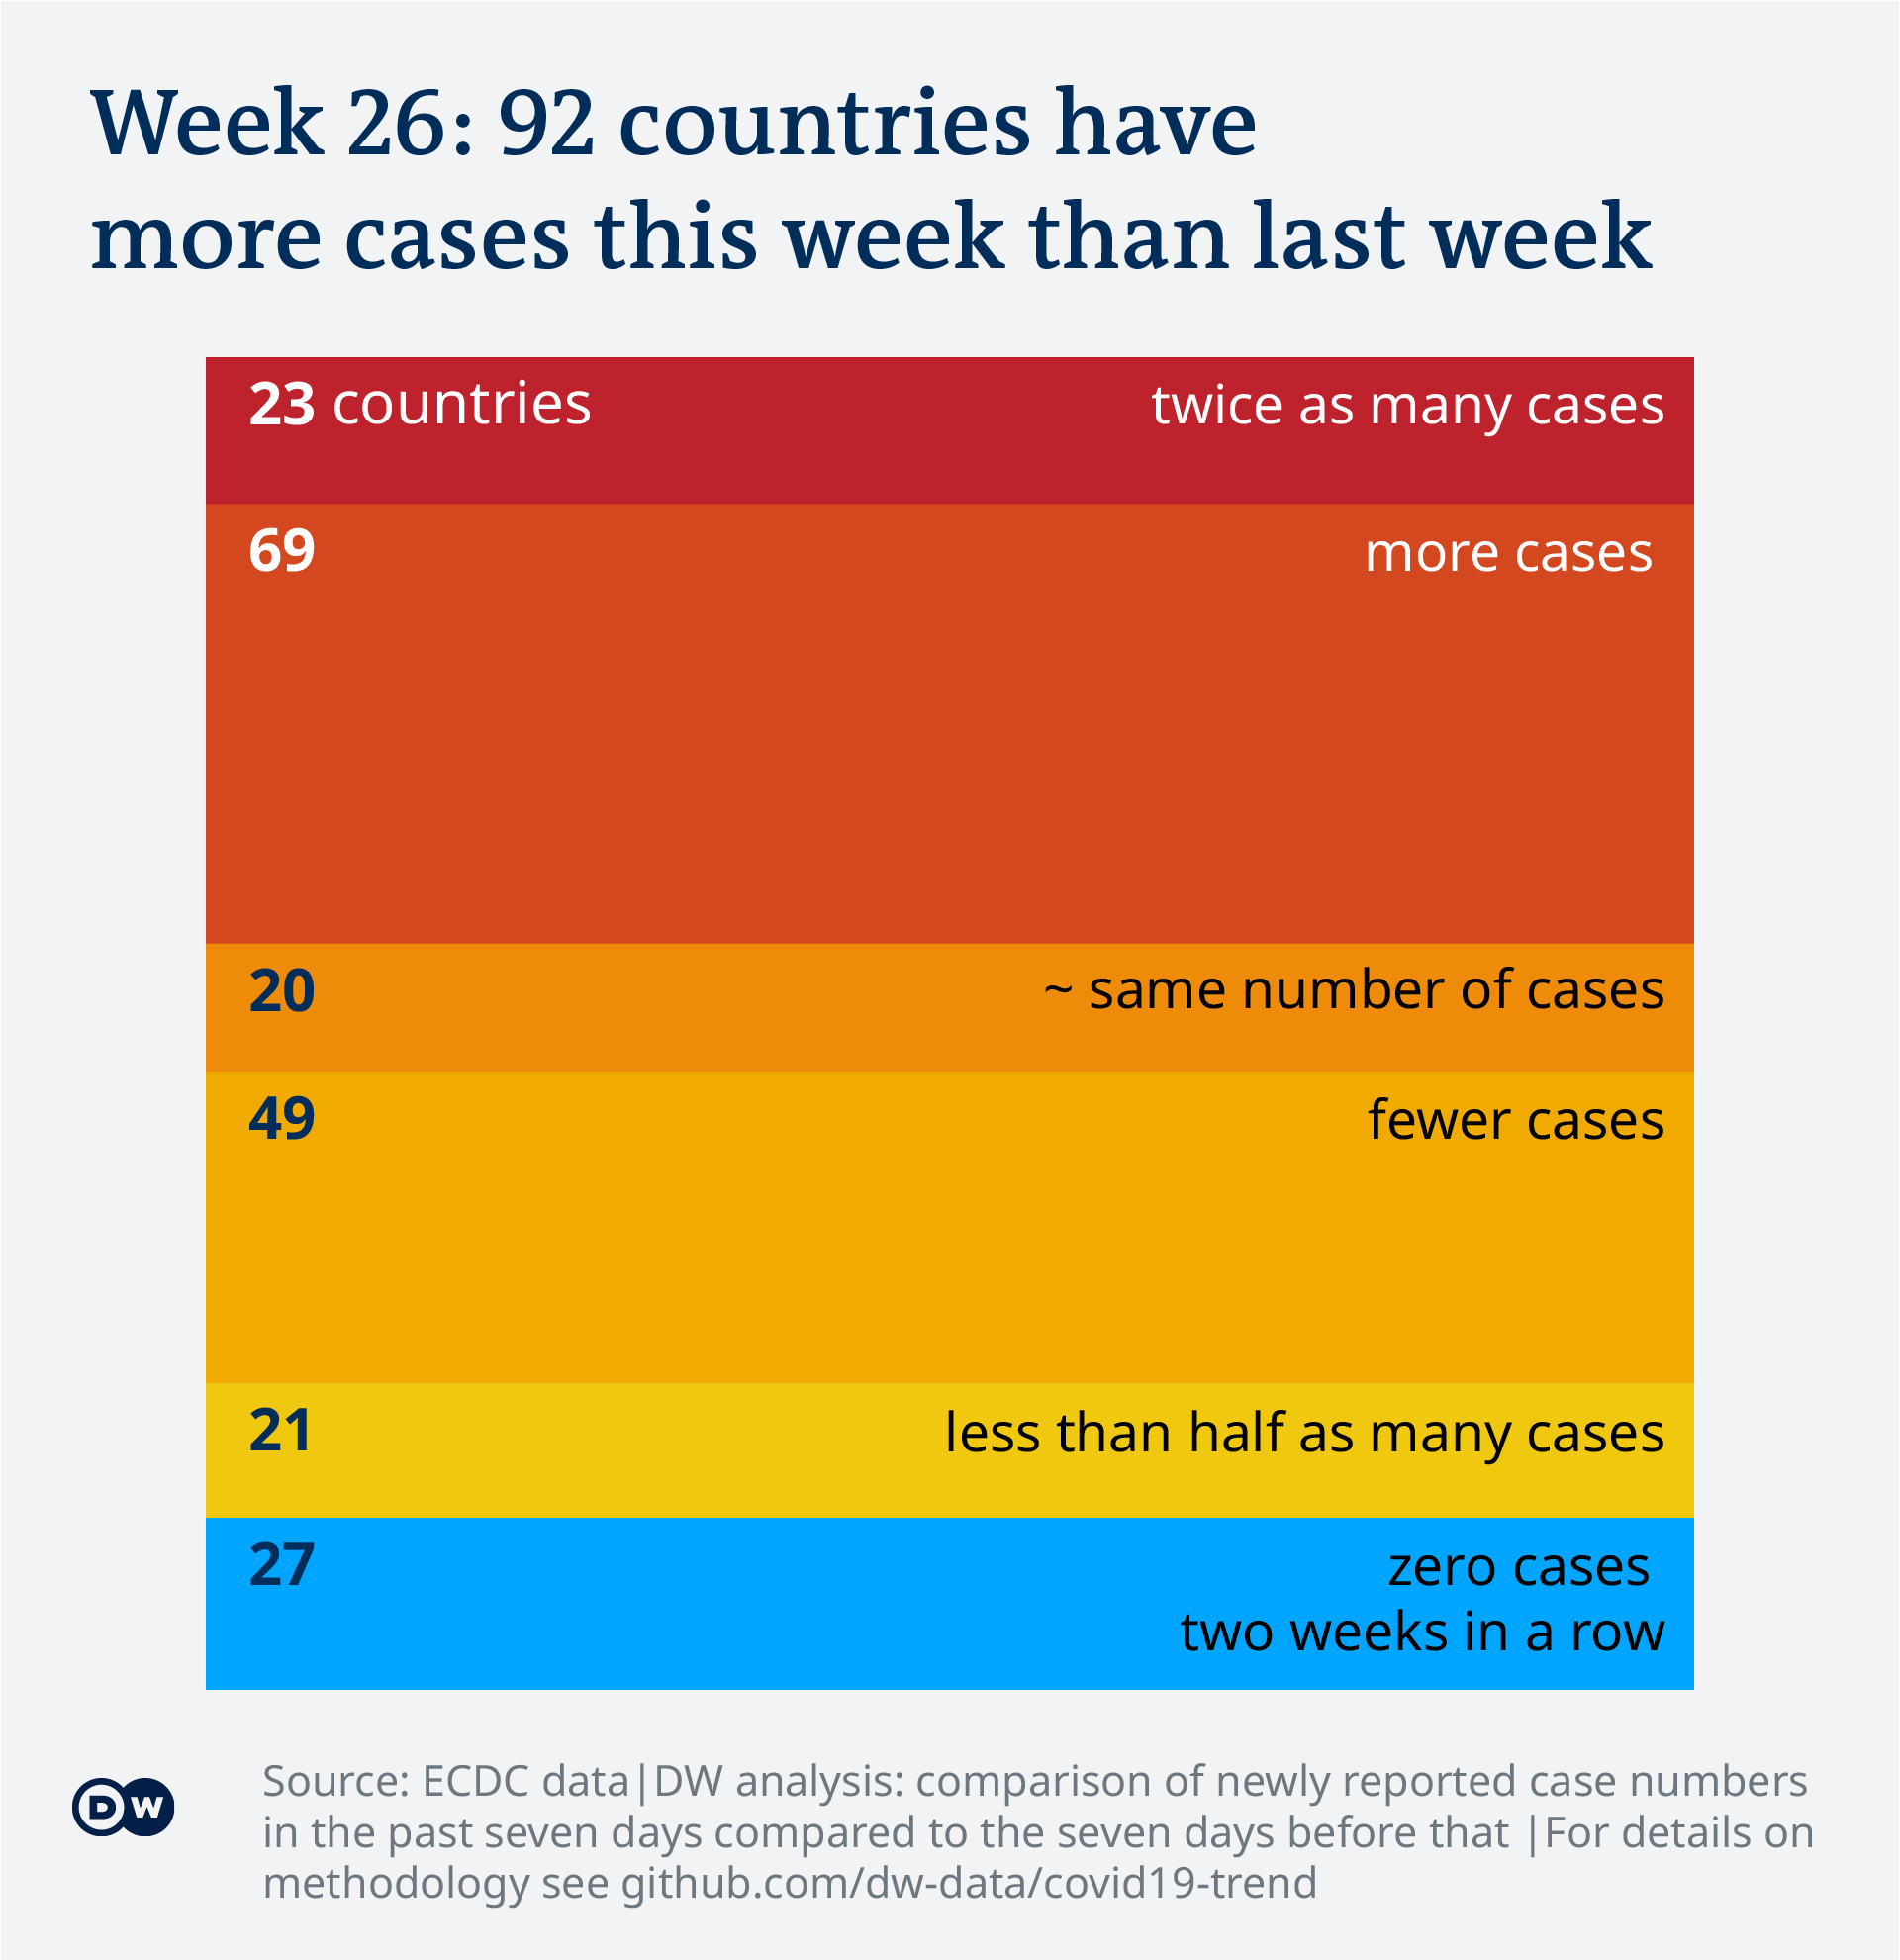 Data visualization: Covid-19 global case numbers trend - calendar week 26